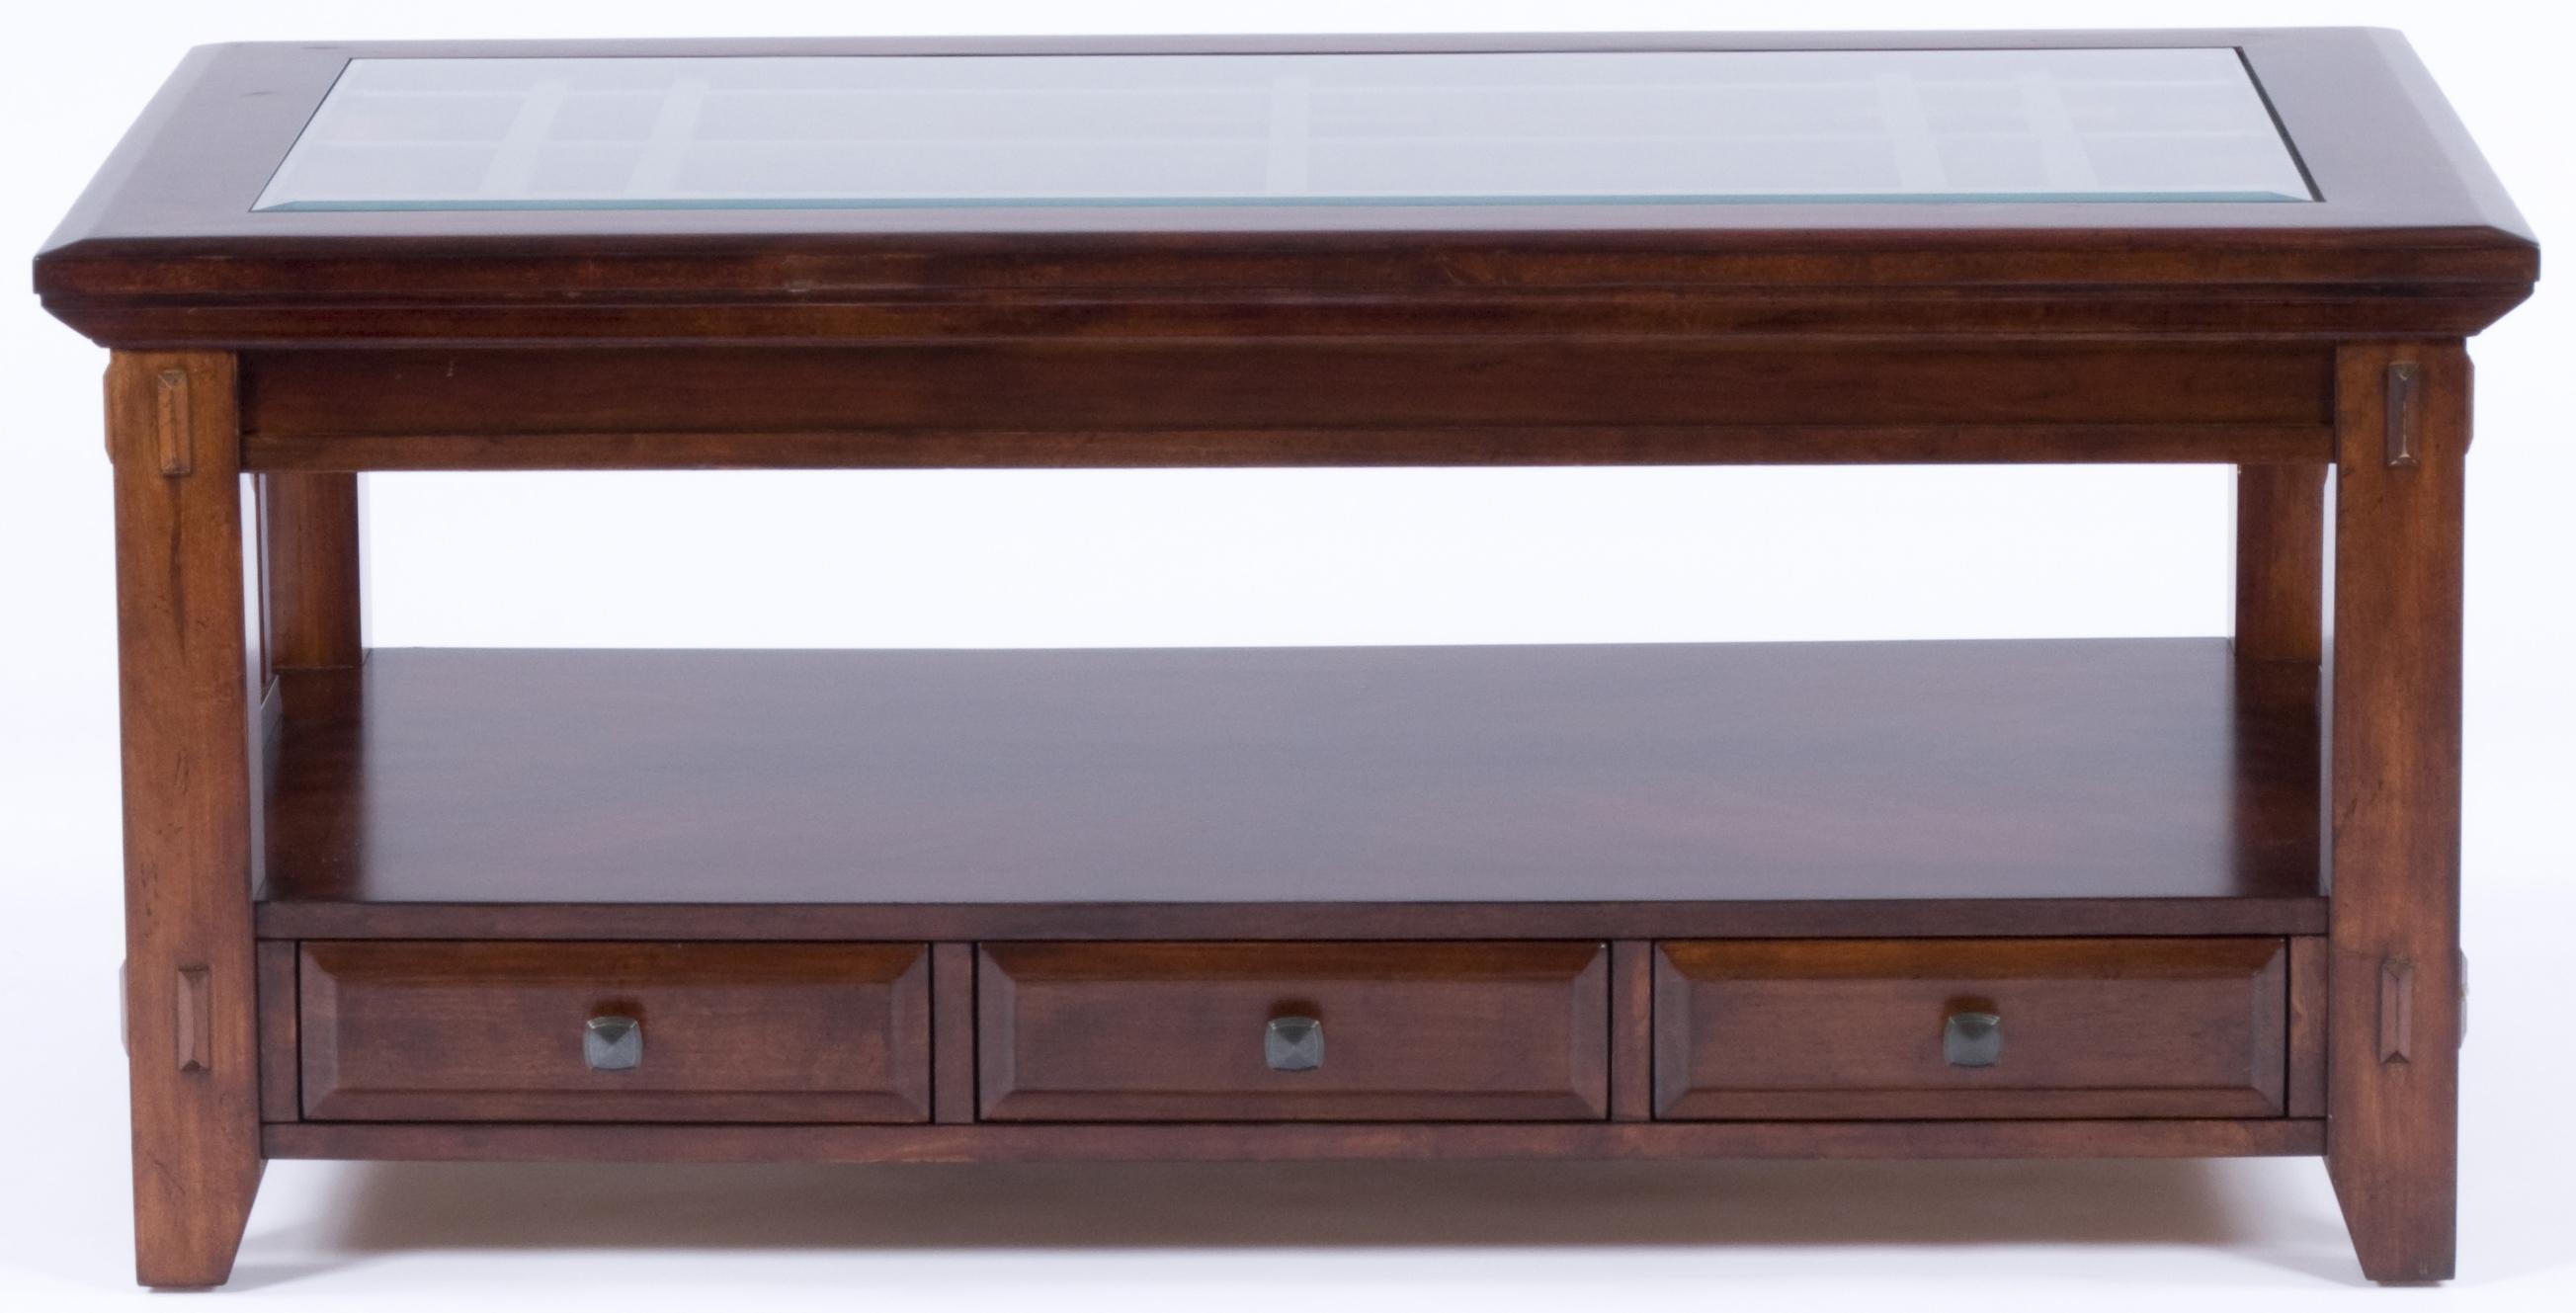 Broyhill Furniture Vantana 4986 001 48 Rectangular Cocktail Table Becker Furniture World